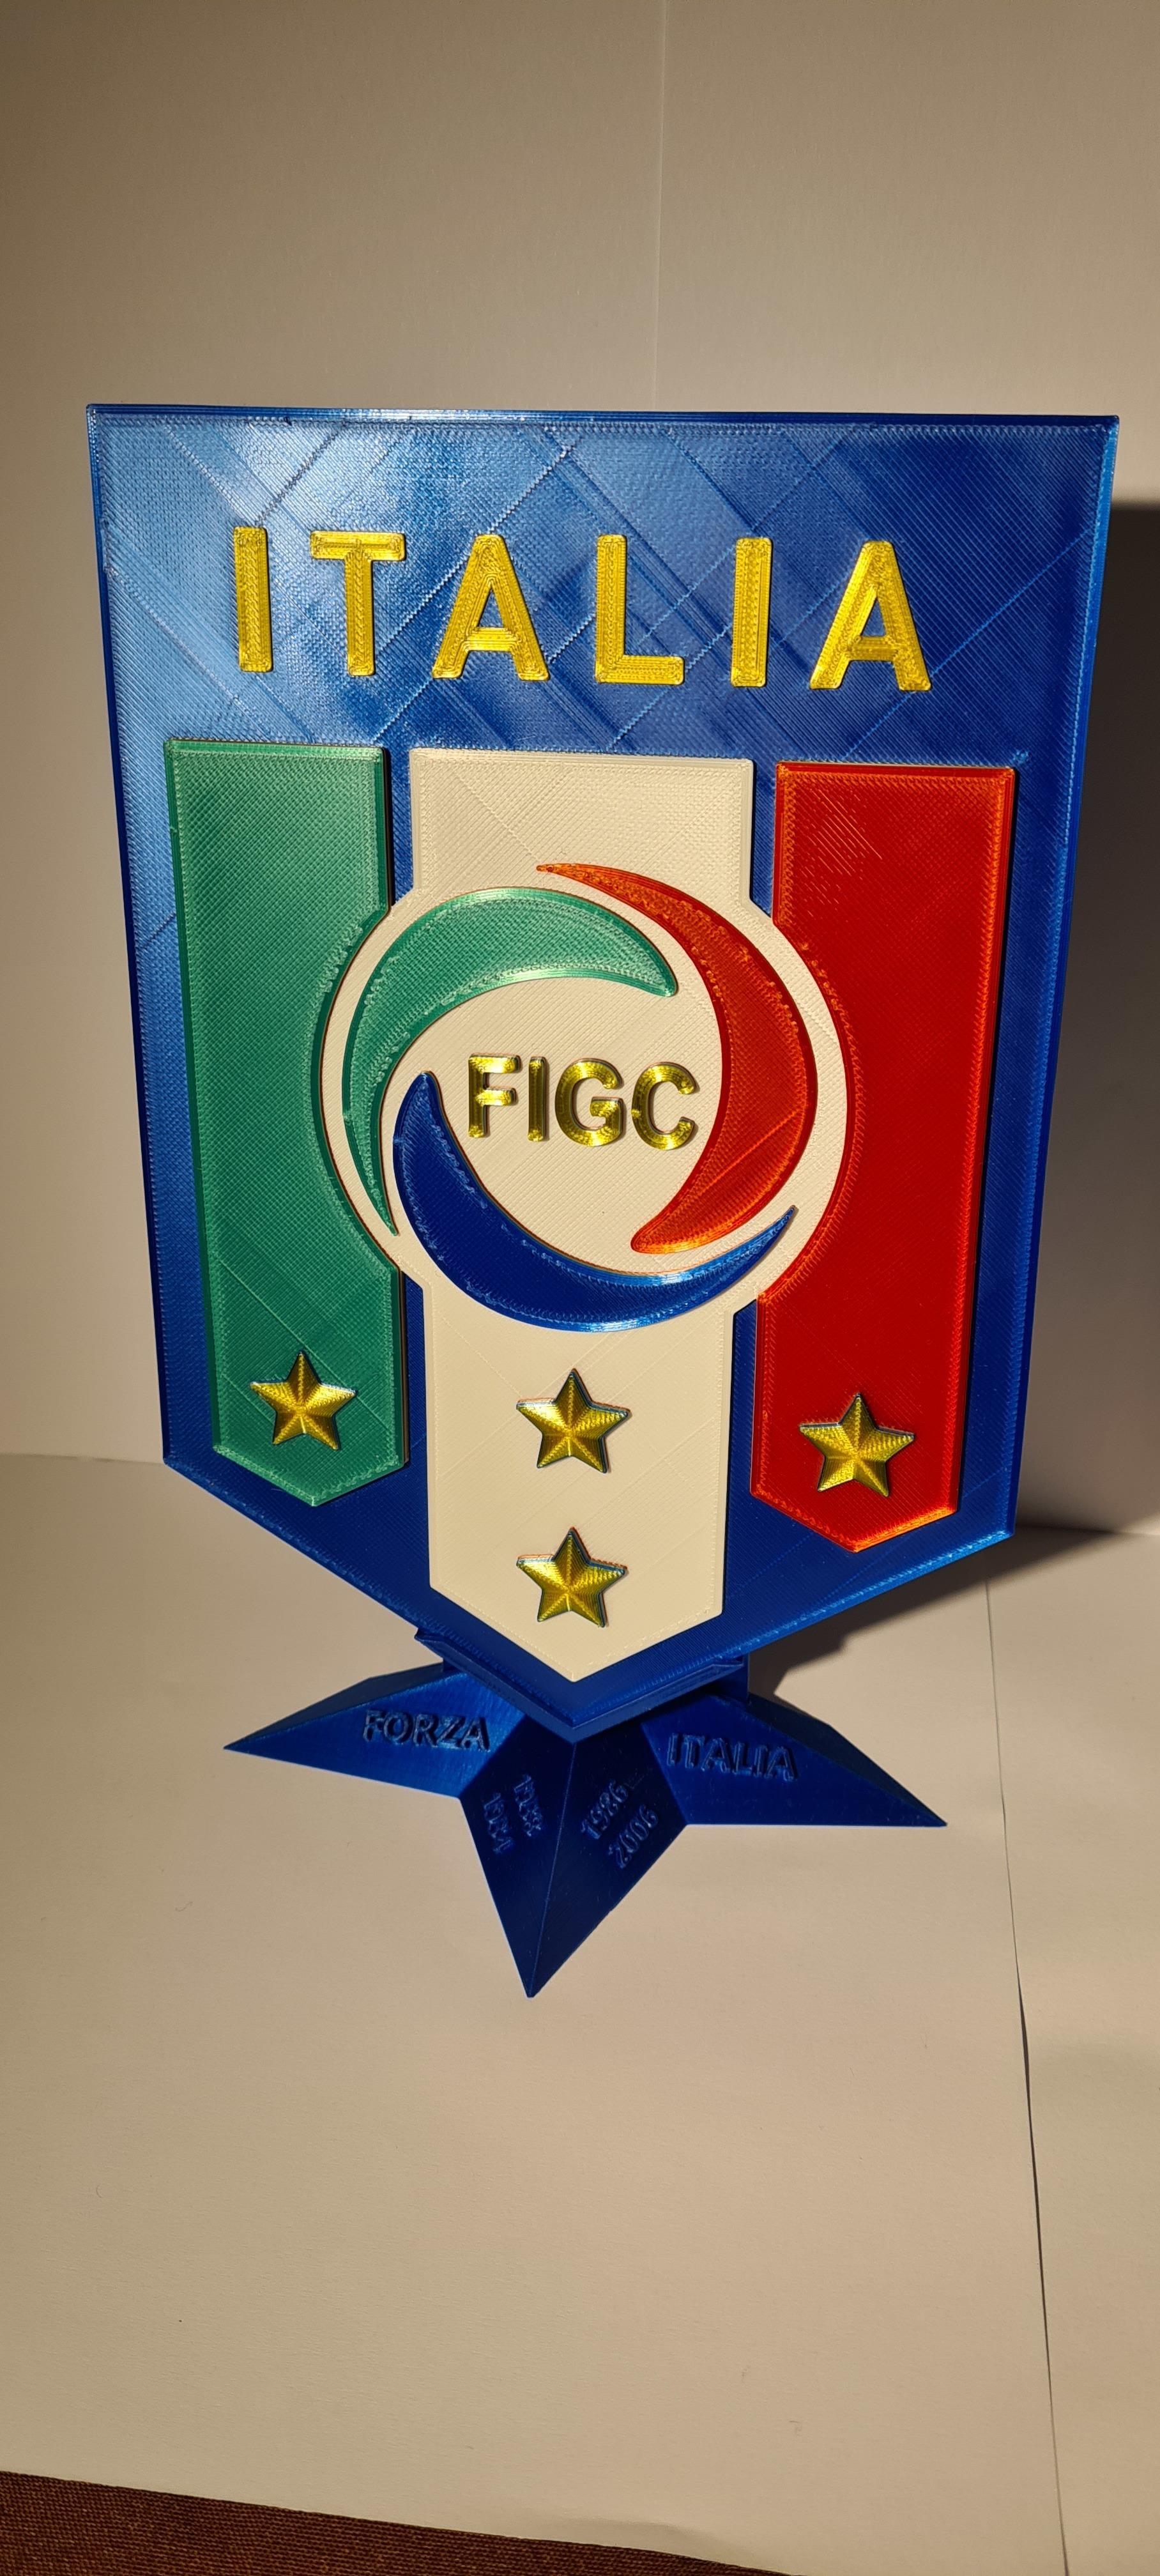 20201017_162002.jpg Télécharger fichier STL Logo italia figc • Objet imprimable en 3D, zimatera